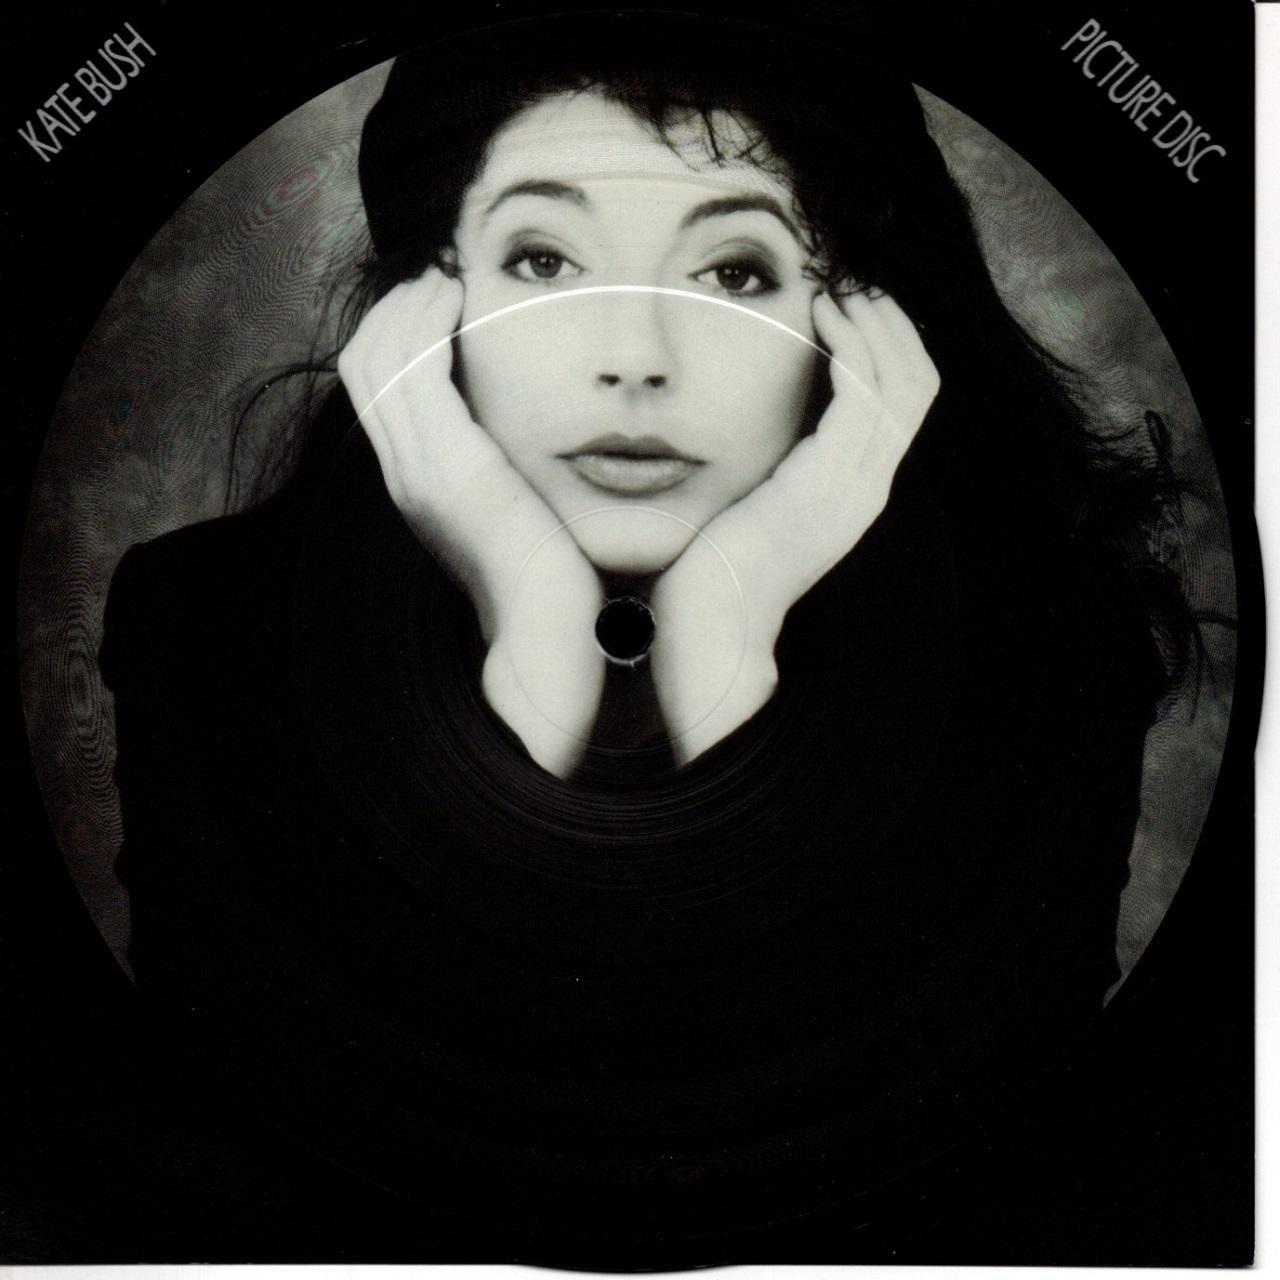 【7inch・英盤】Kate Bush / This Woman's Work